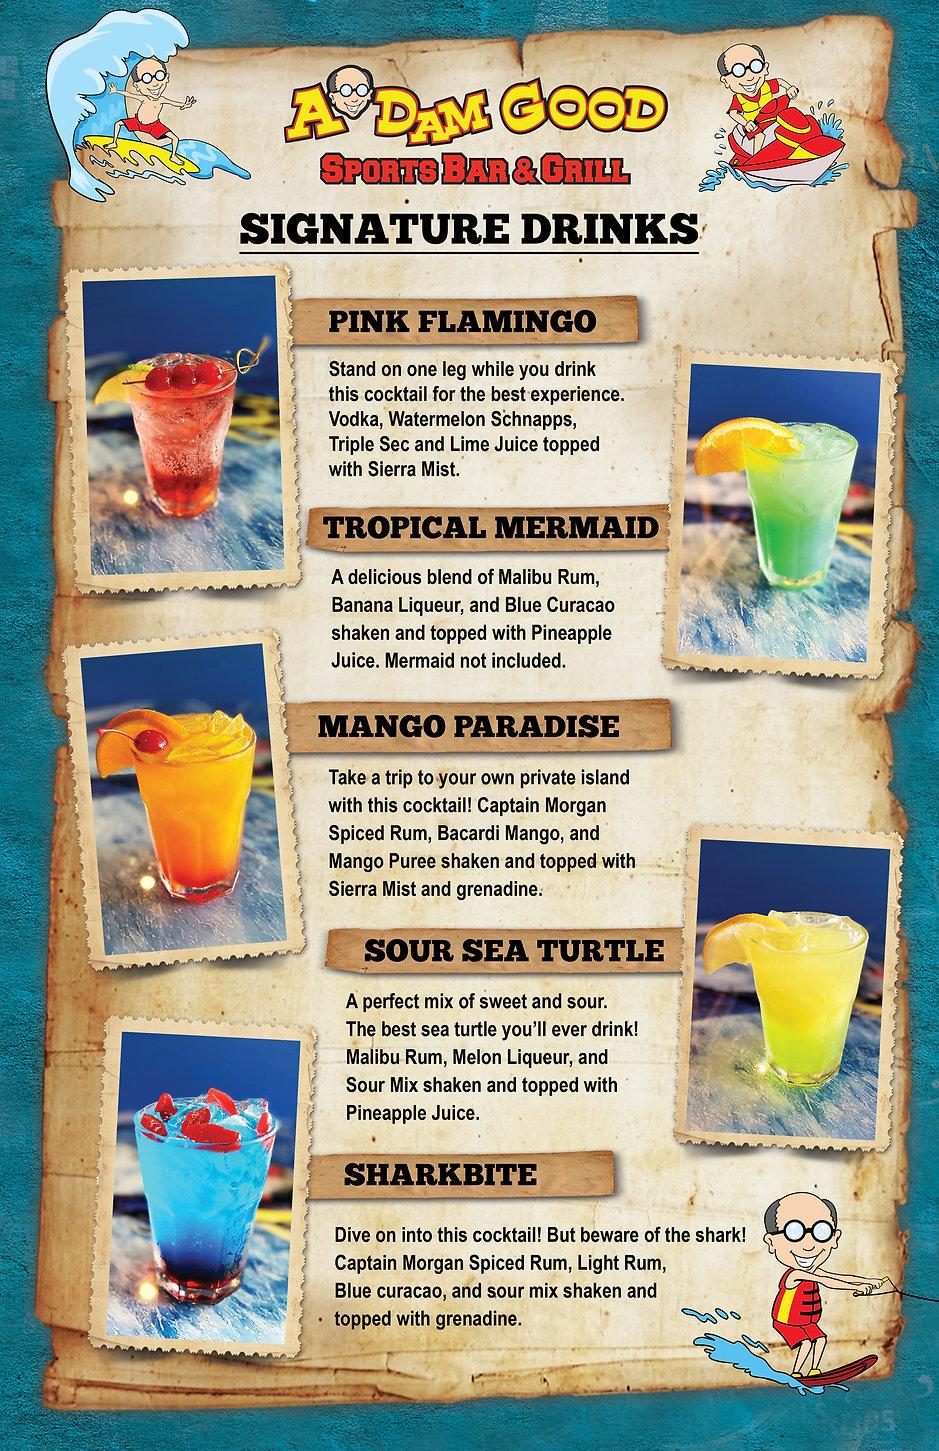 A'Dam-Good-Sports-Bar-Menu-11x17---Drinks-Page---RGB.jpg